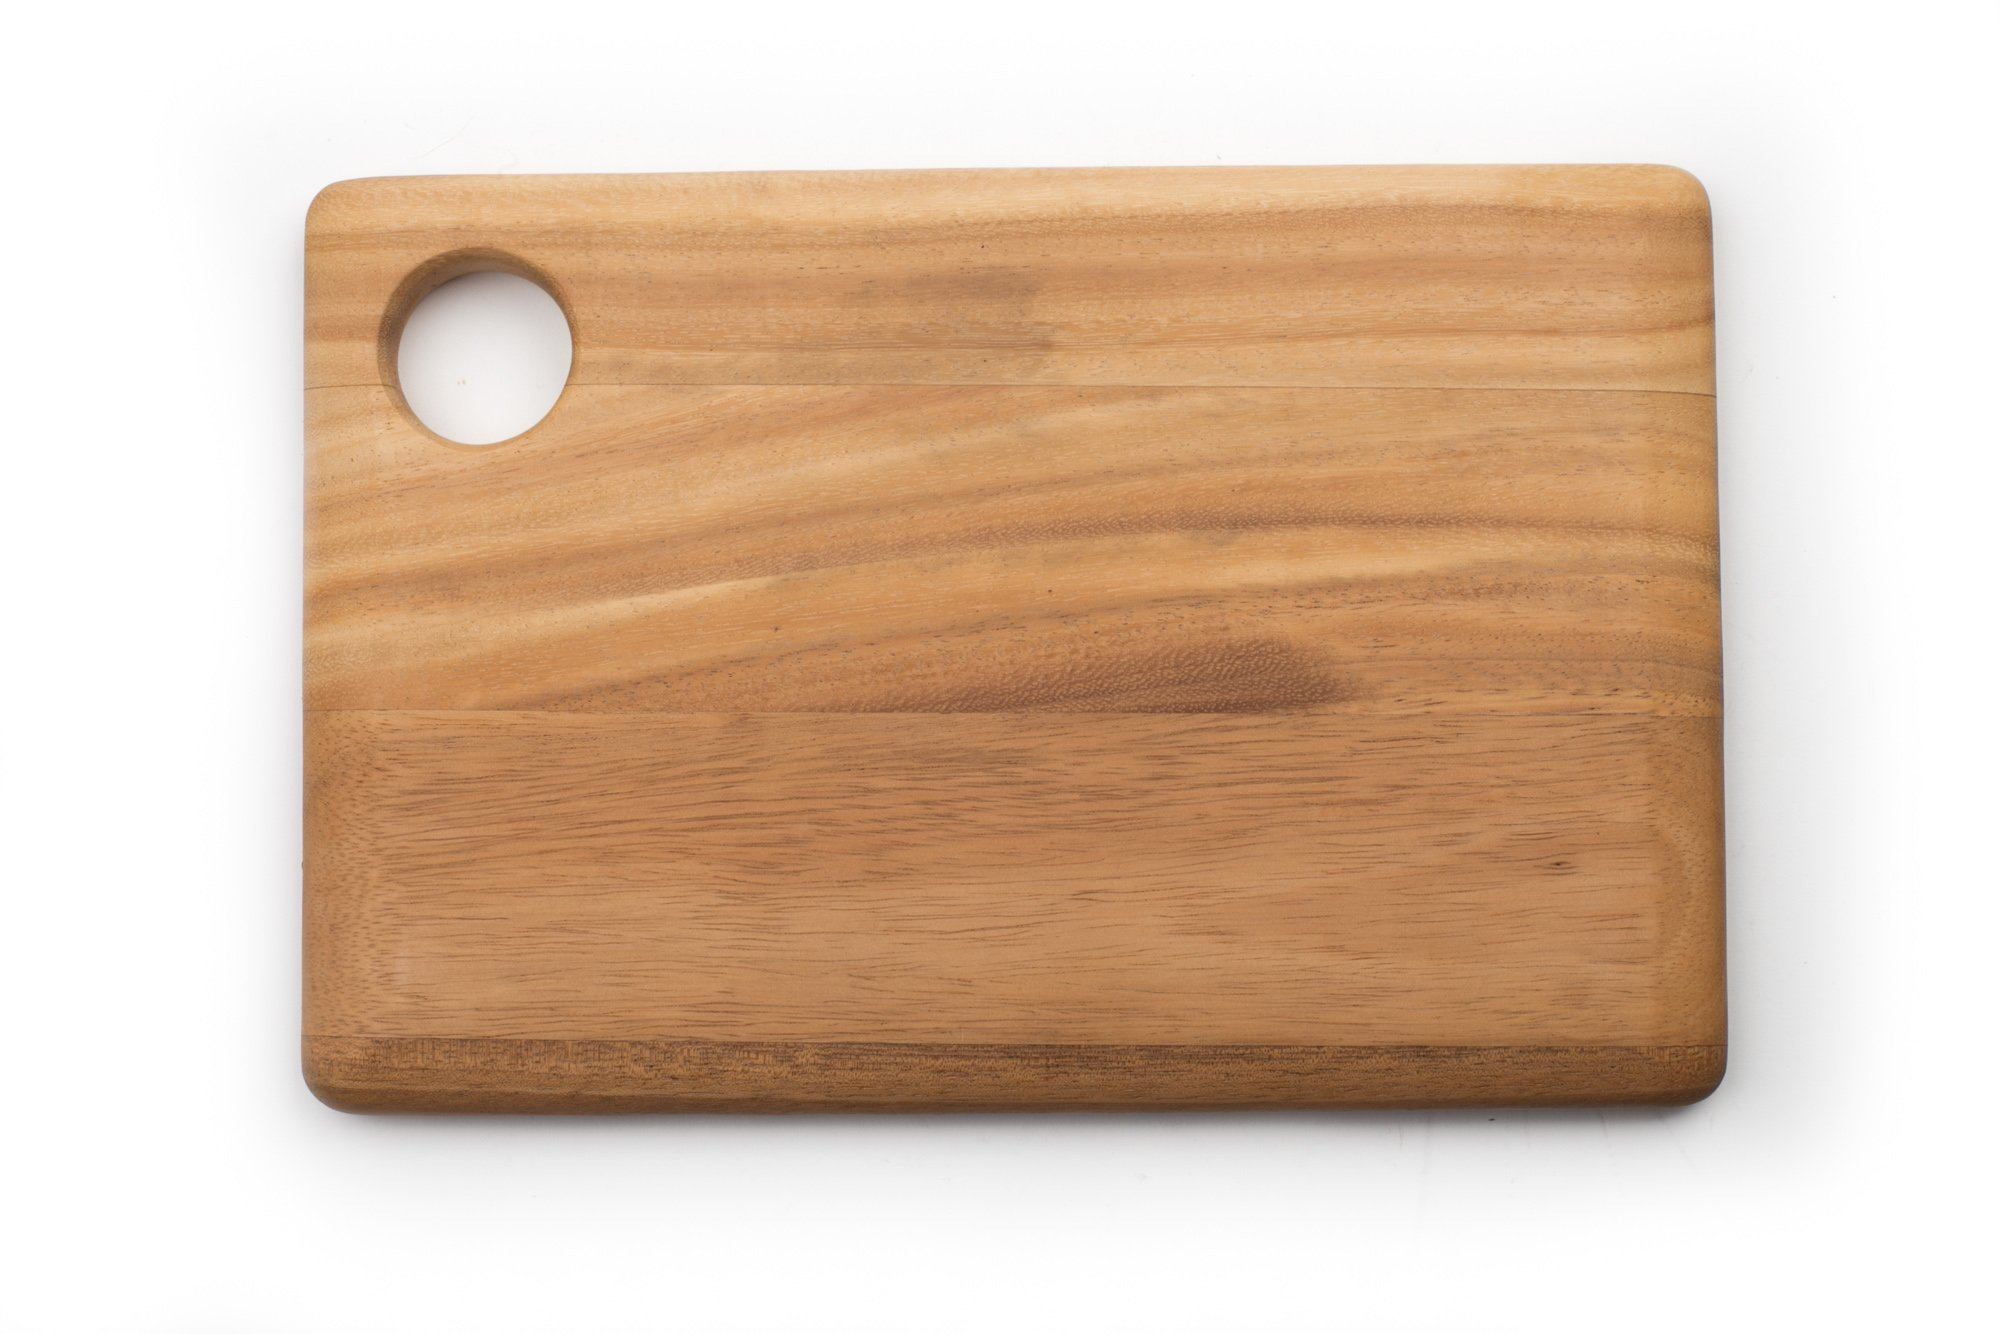 Ironwood Gourmet 28197 Rectangular Everyday Cutting Board, Acacia Wood